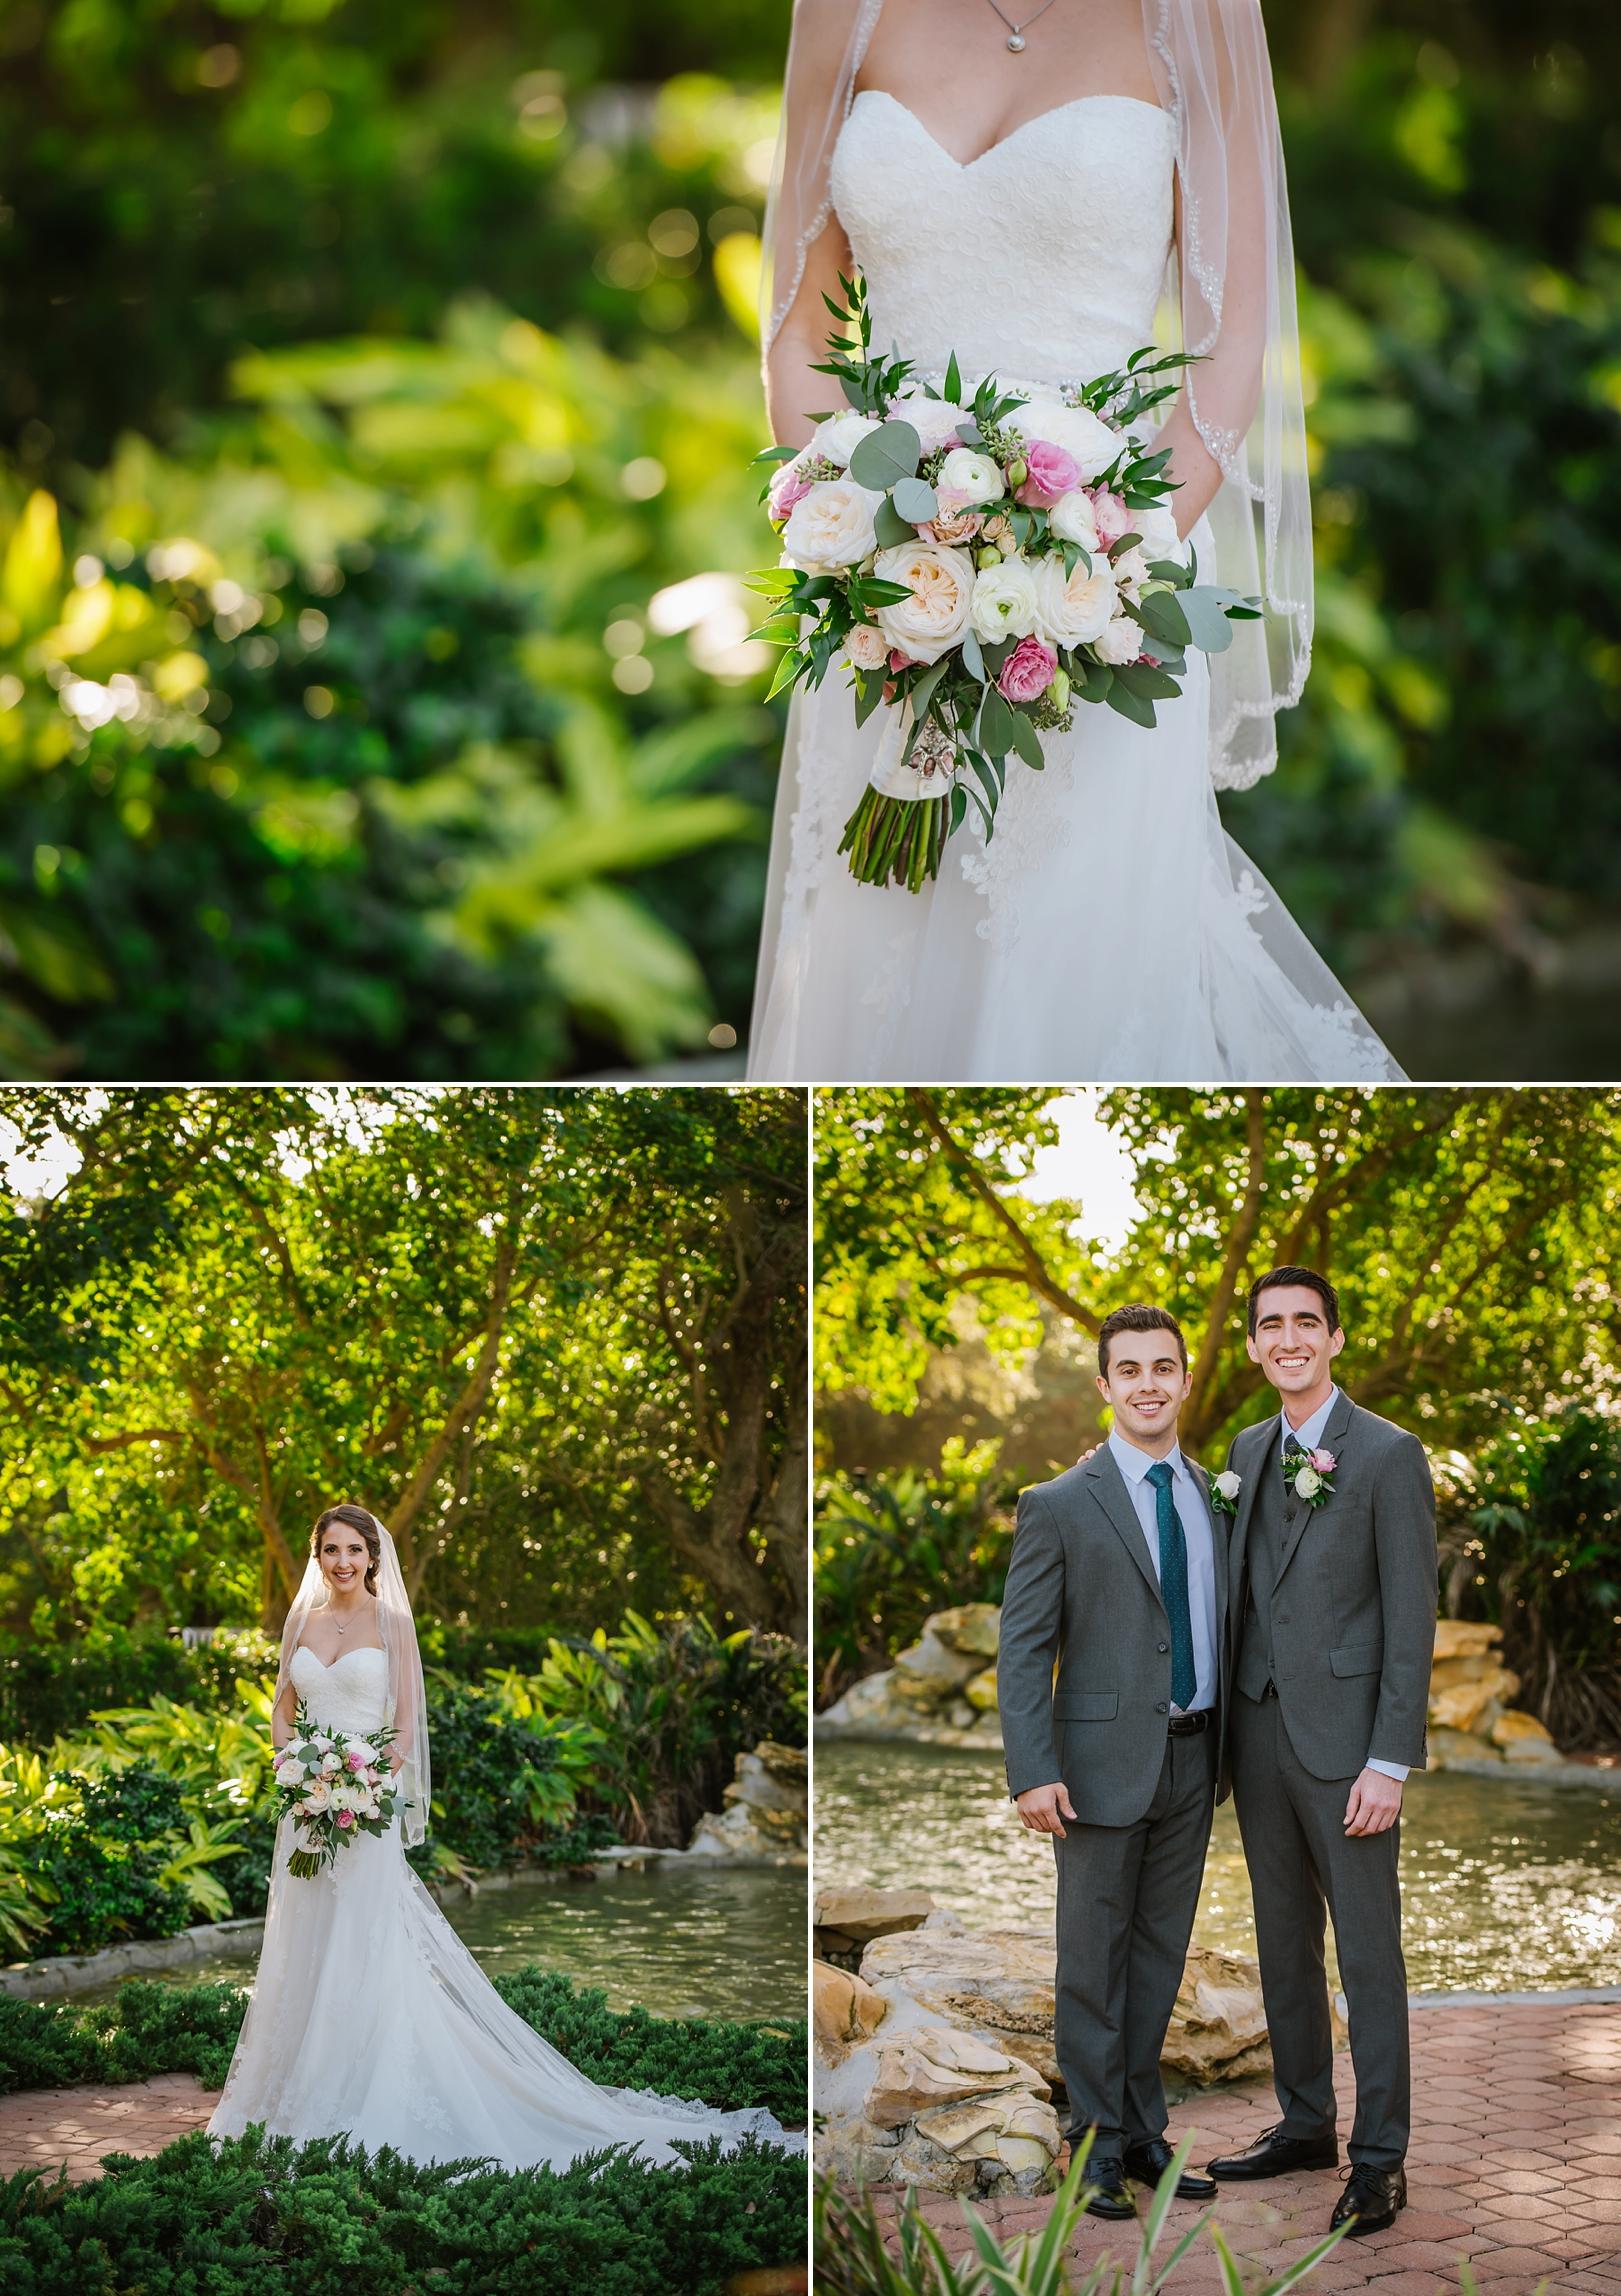 miami-wedding-photography-ashlee-hamon-elegant-vintage-antique-wedding_0014.jpg